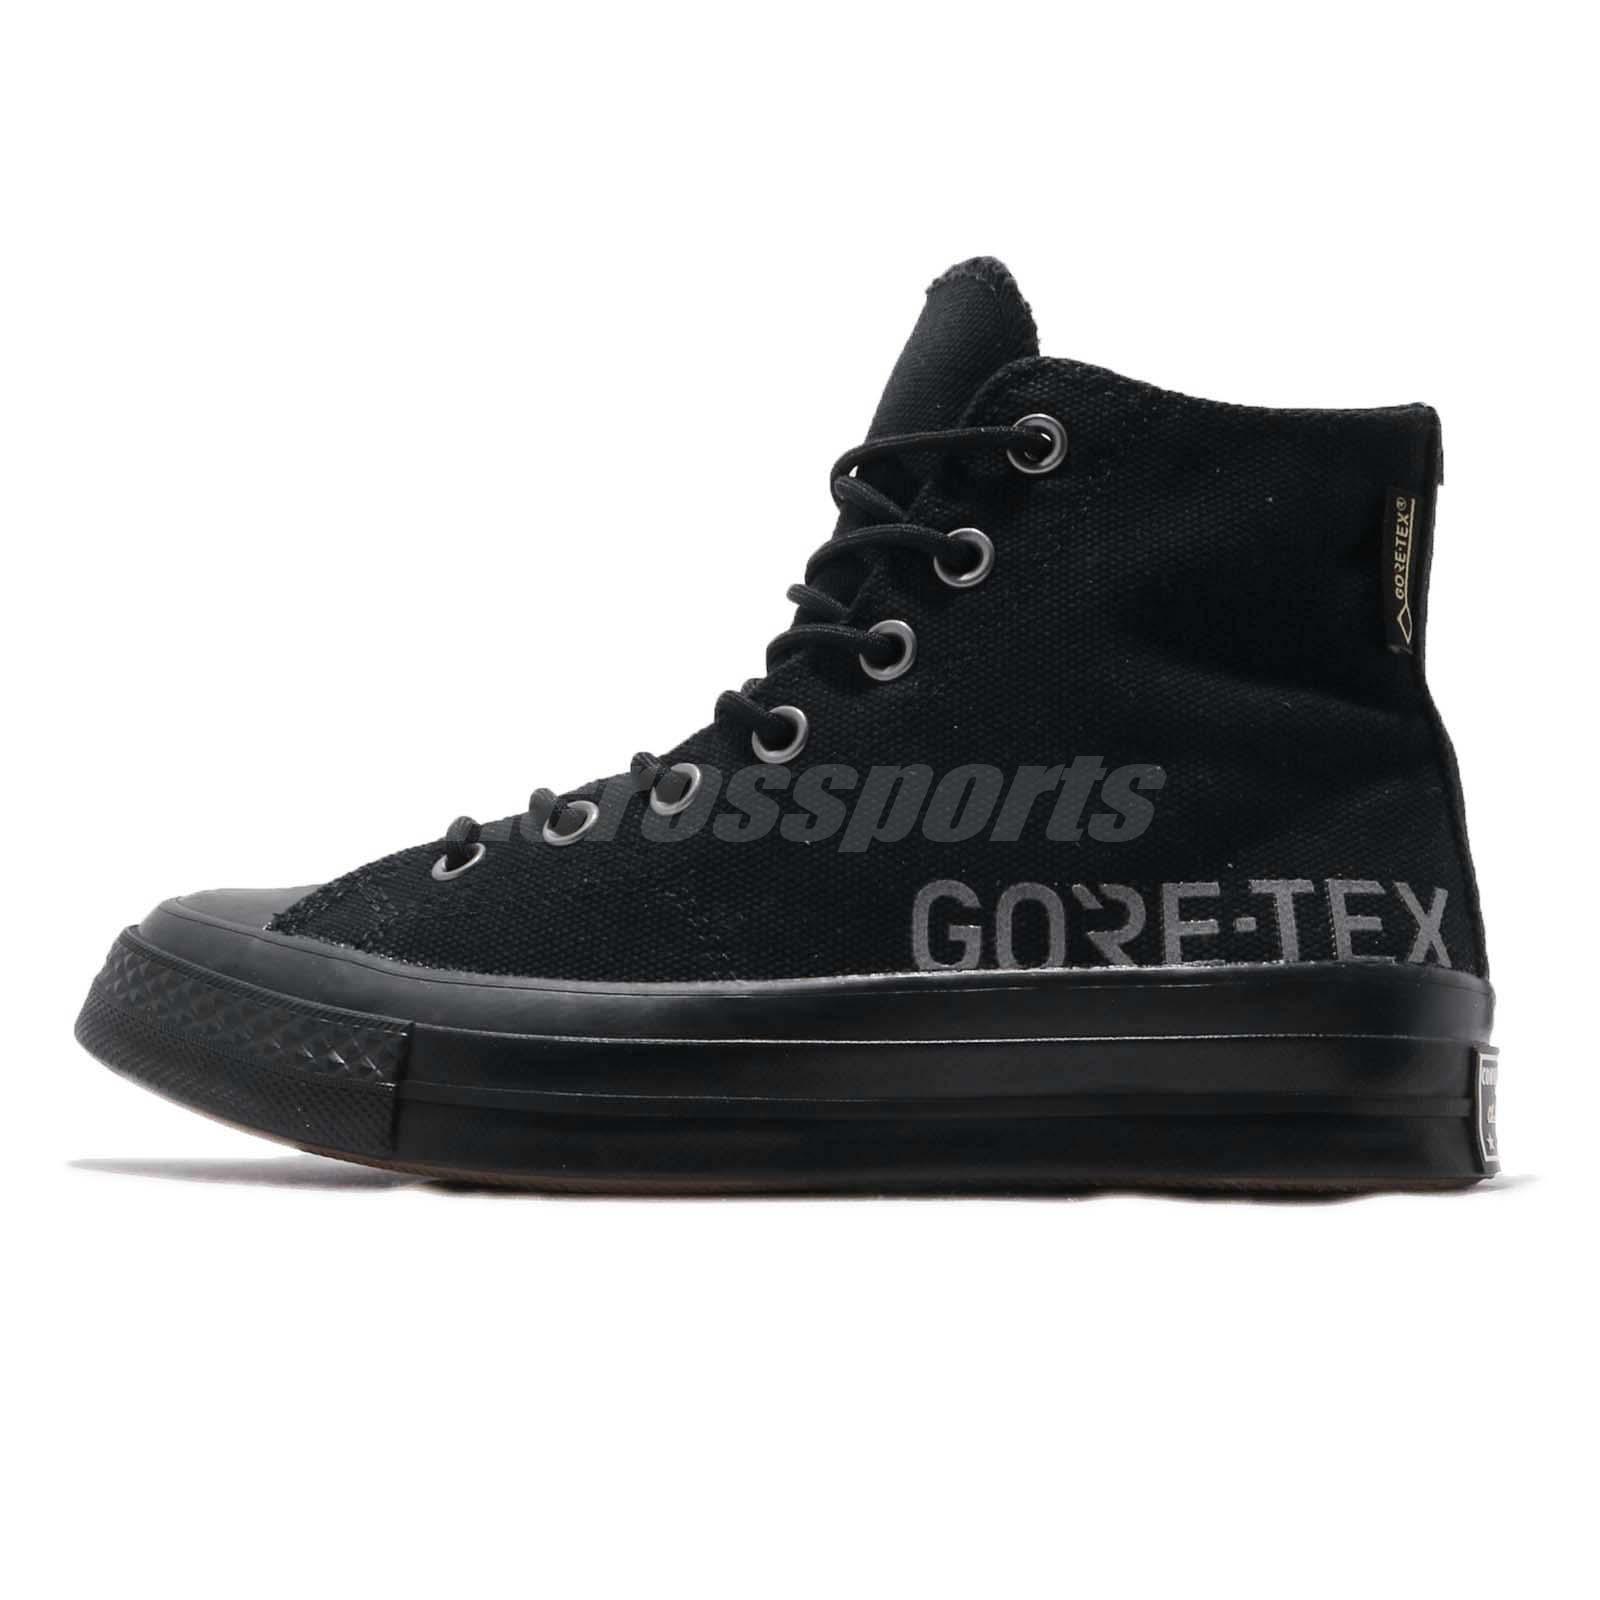 15a3810f00b4bb Converse First String Chuck Taylor All Star 70 Hi Gore-Tex Men Black 162350C